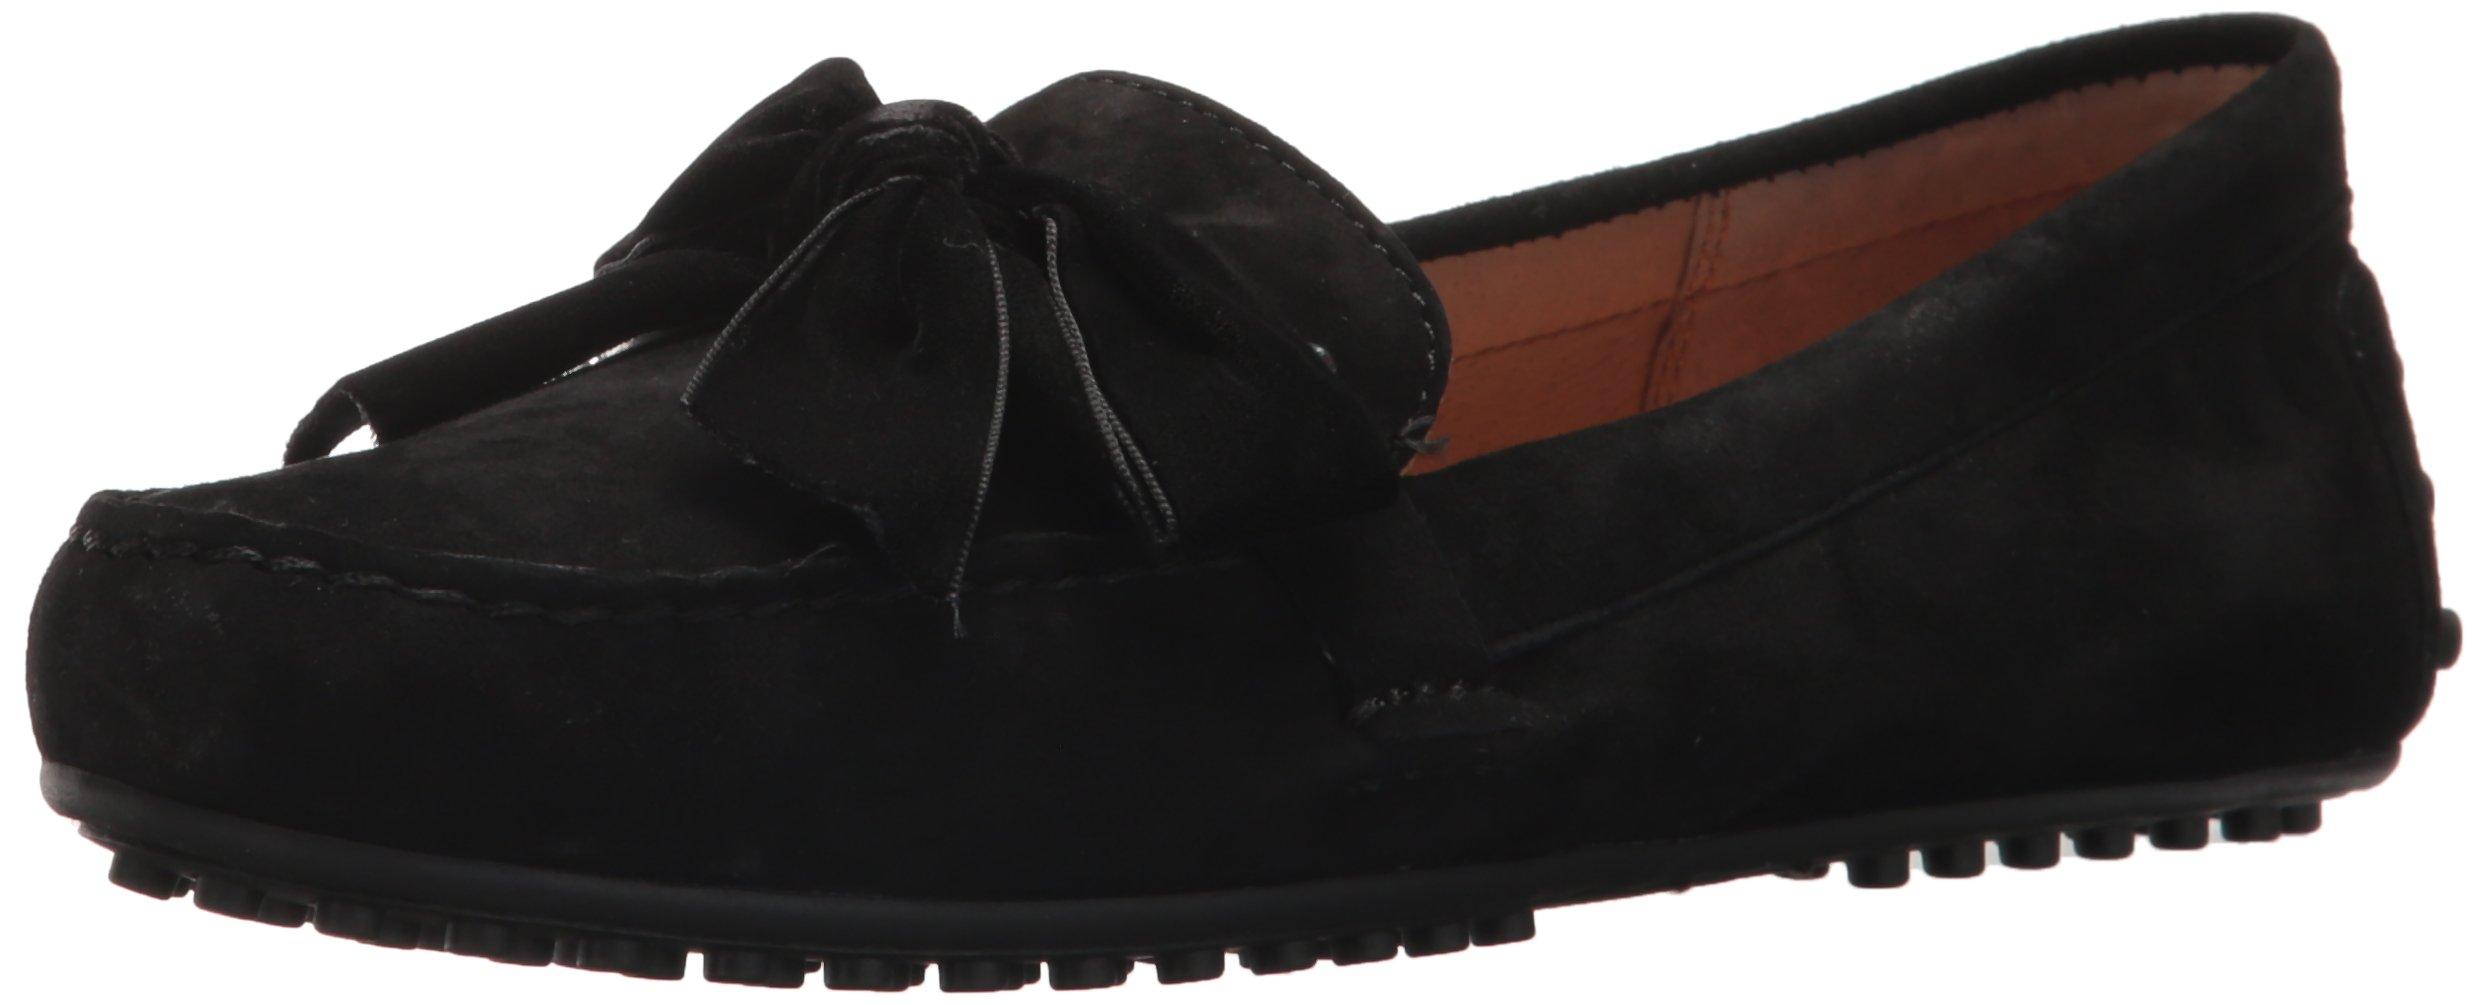 Lauren Ralph Lauren Women's Bayleigh Driving Style Loafer, Black, 7 B US